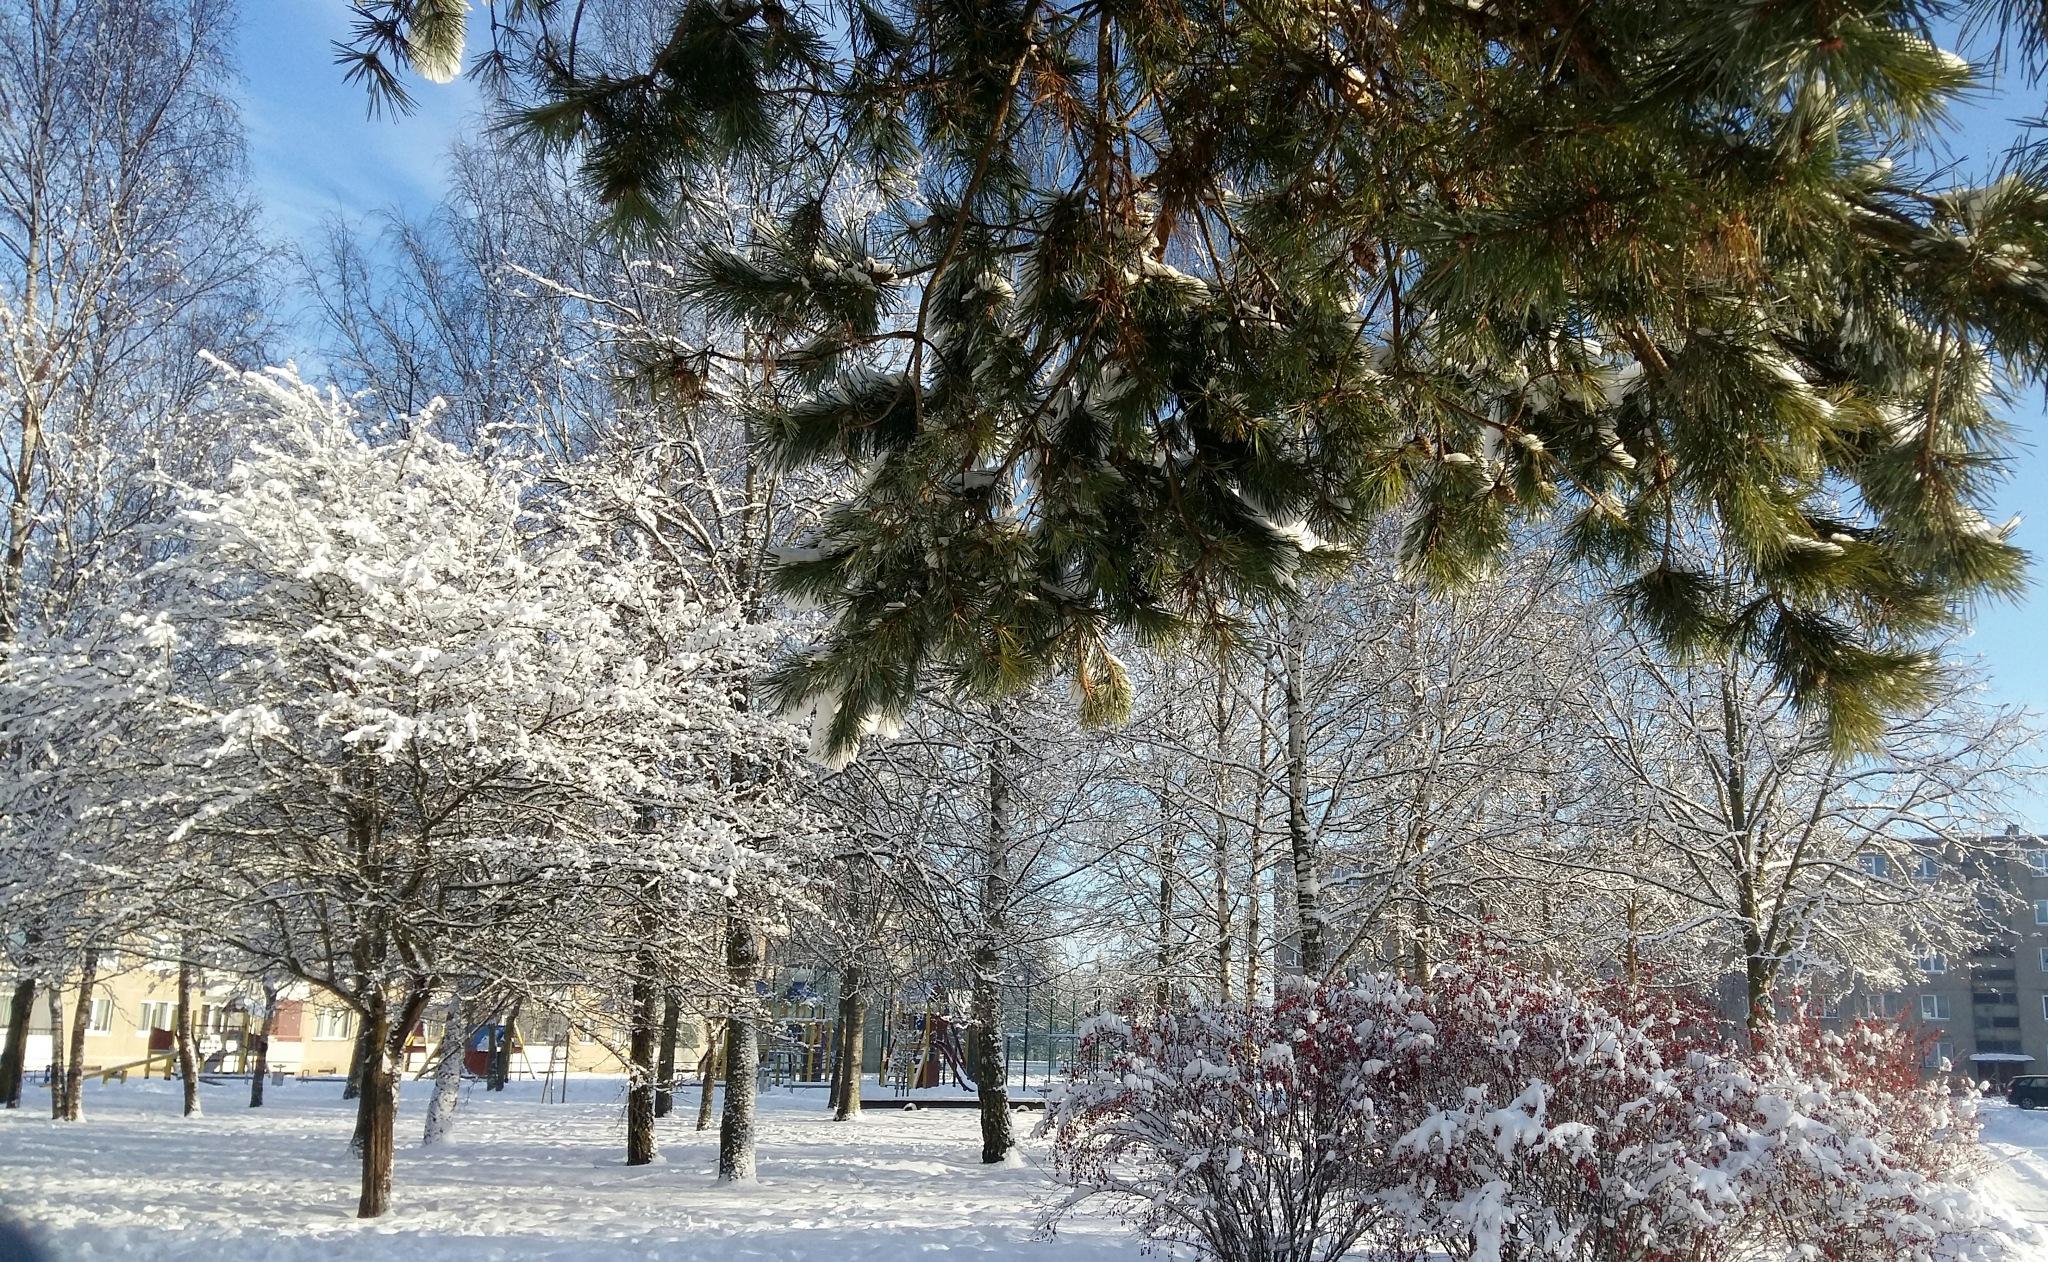 The park trees. by uzkuraitiene62